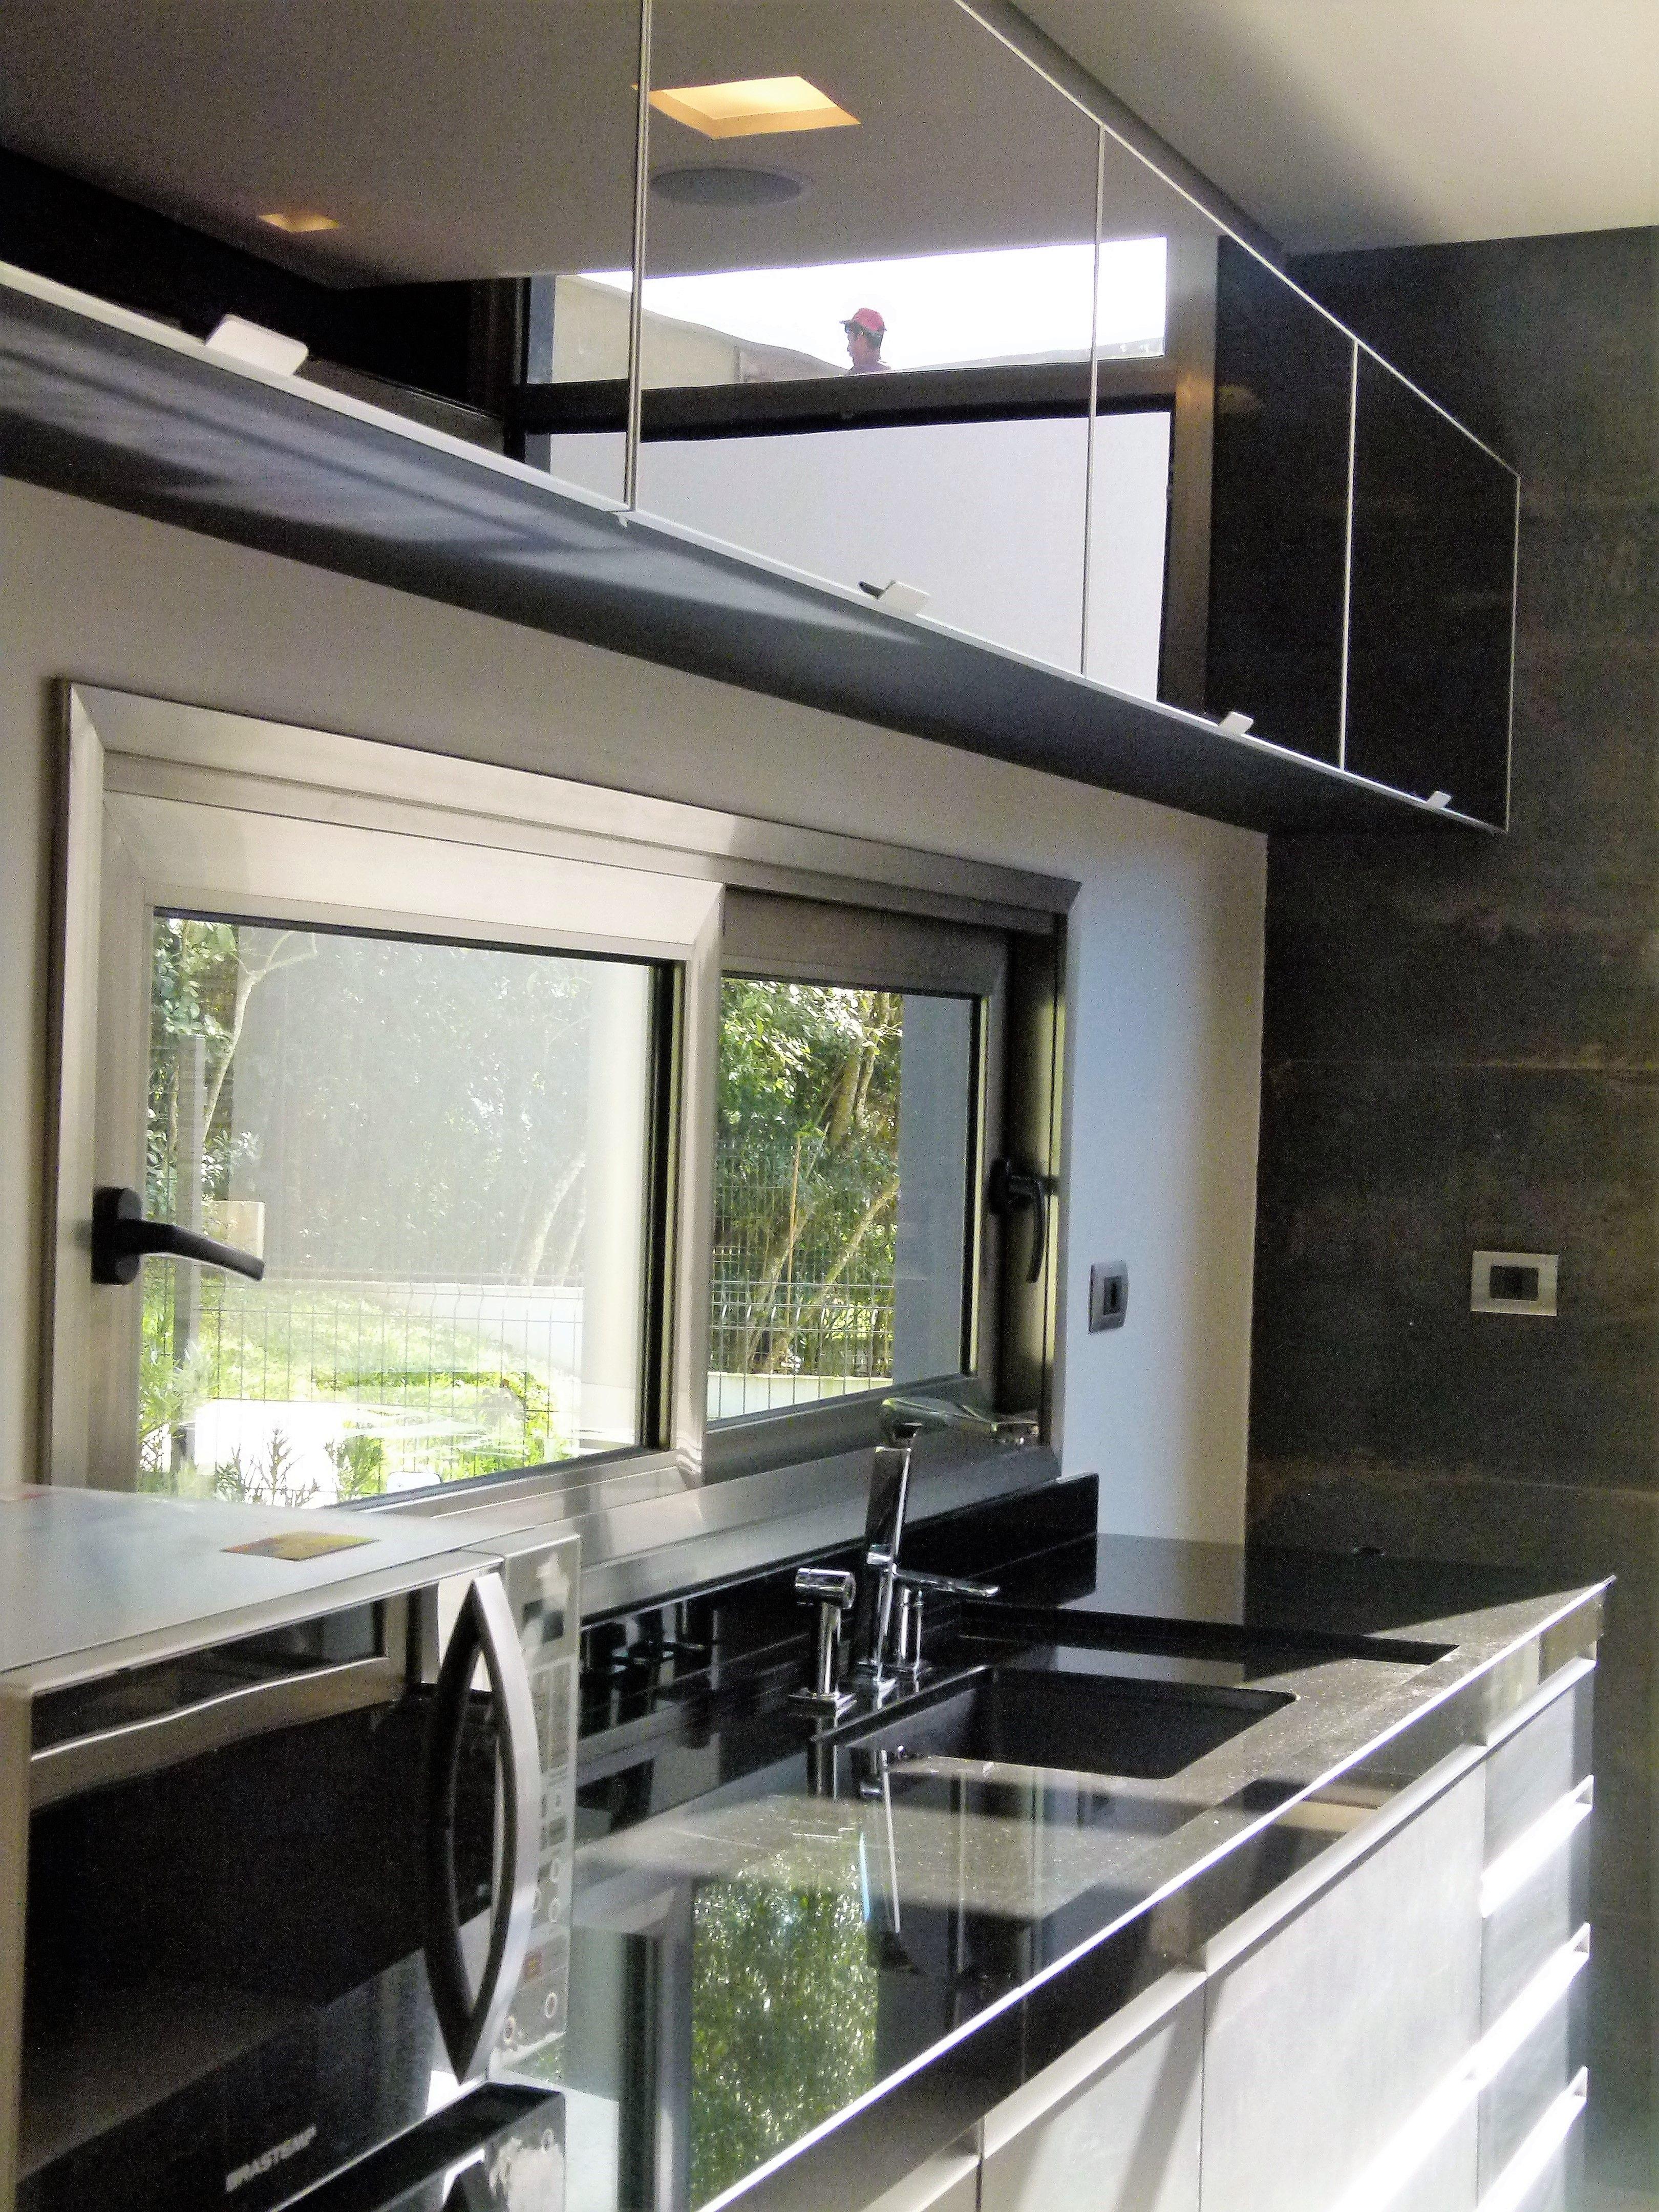 Cozinha Preta Janela Alum Nio Pintura Cor Inox Arquiteta Elisa  ~ Cozinha Planejada Preta E Inox